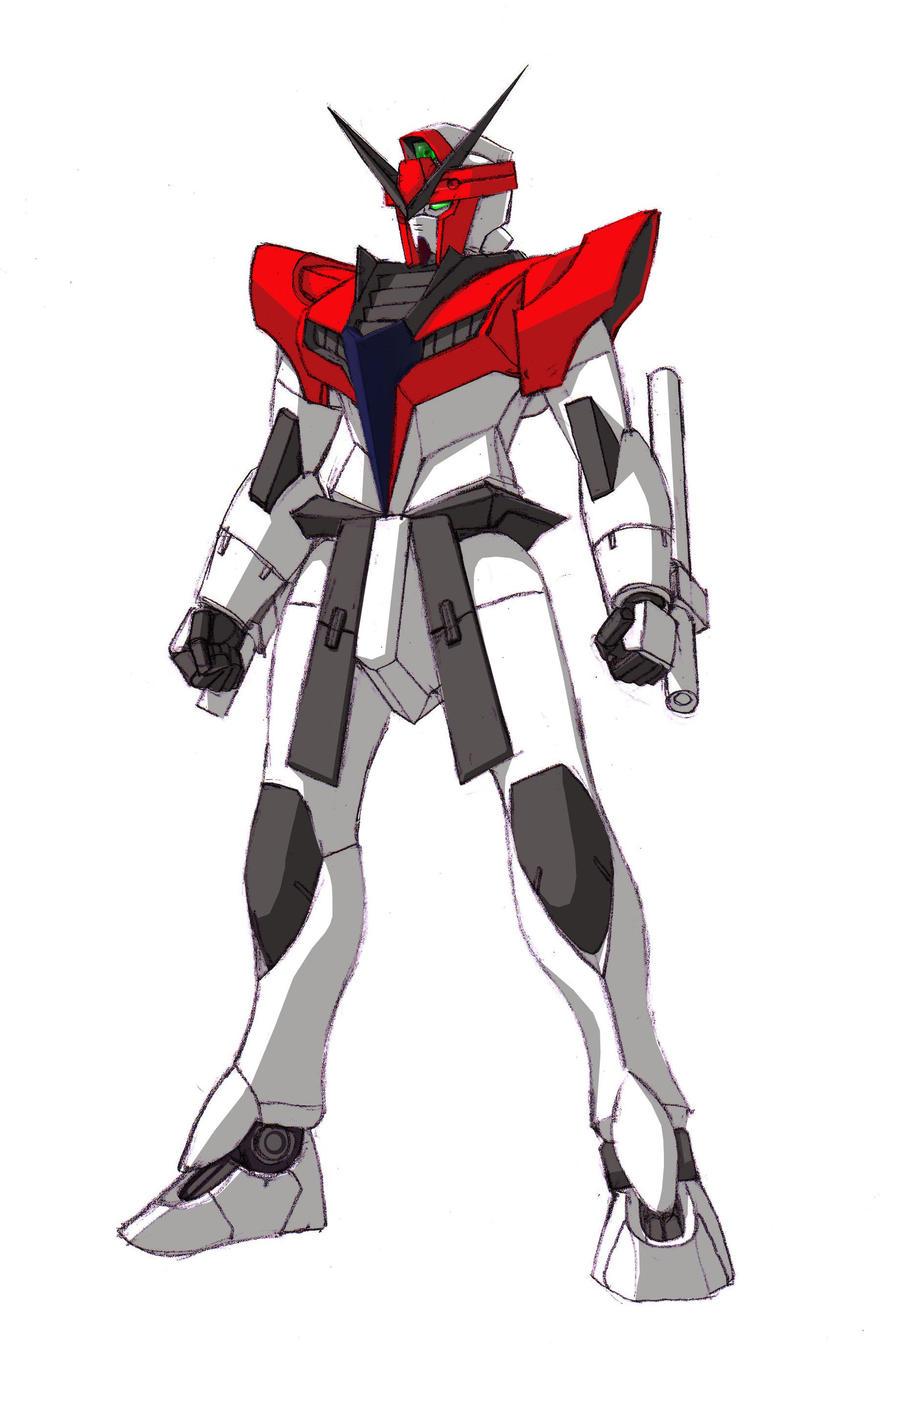 GF14-001NI Silek Gundam by Tecmopery